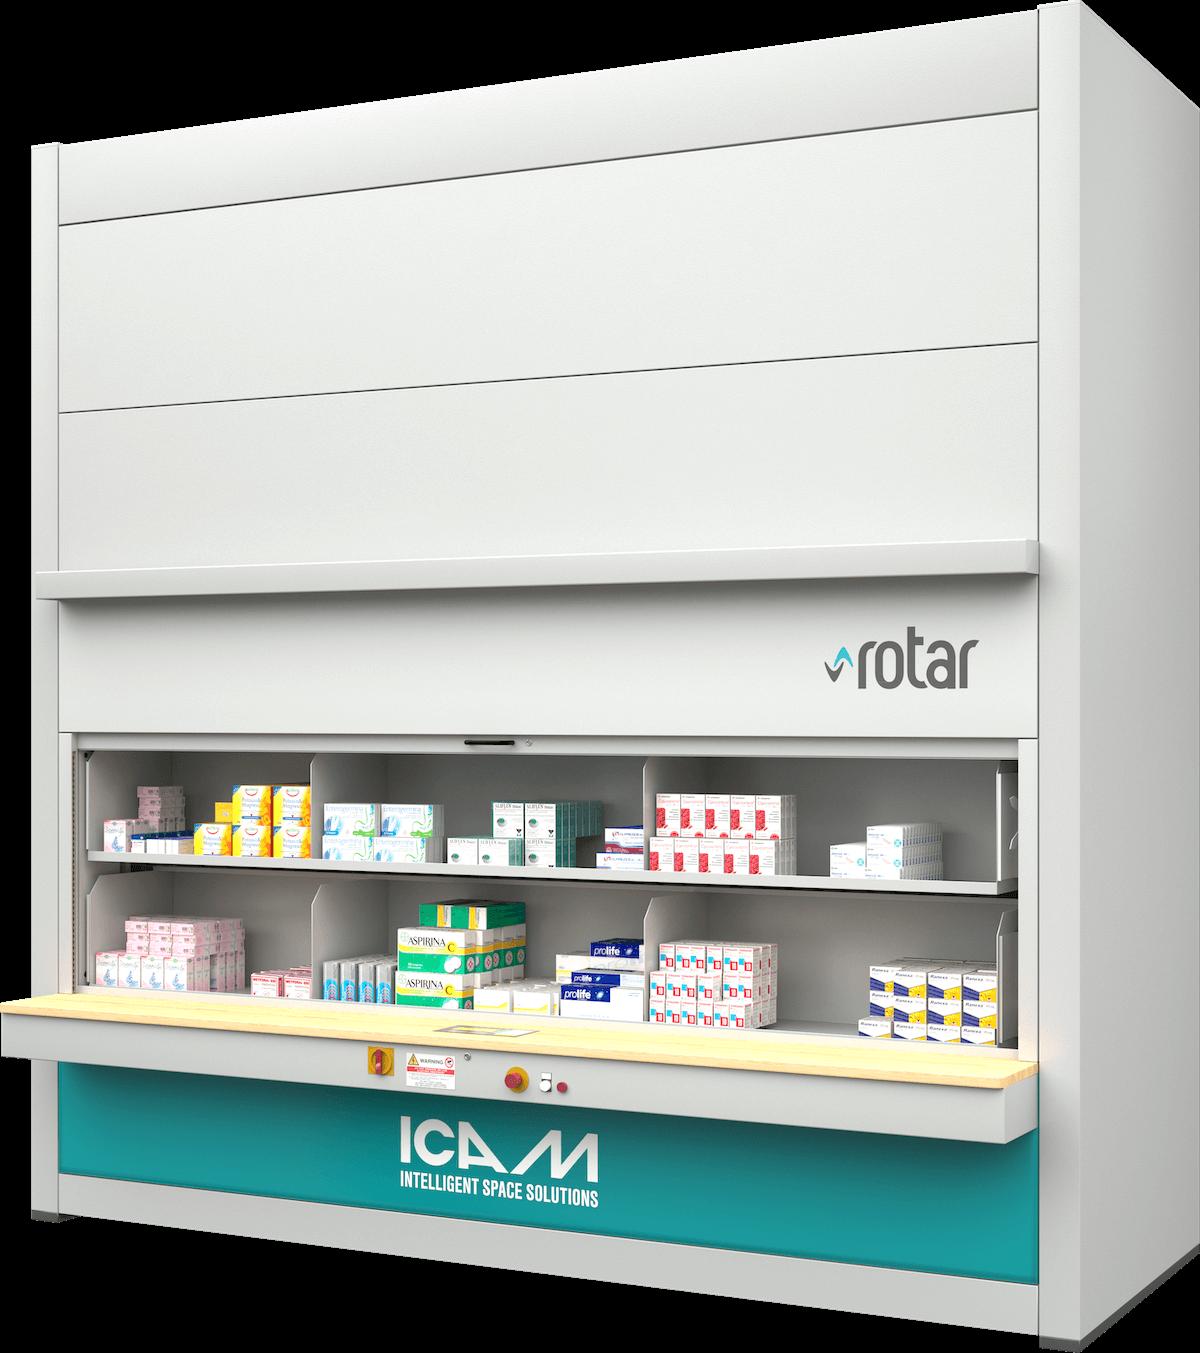 ICAM | Rotar - Healthcare